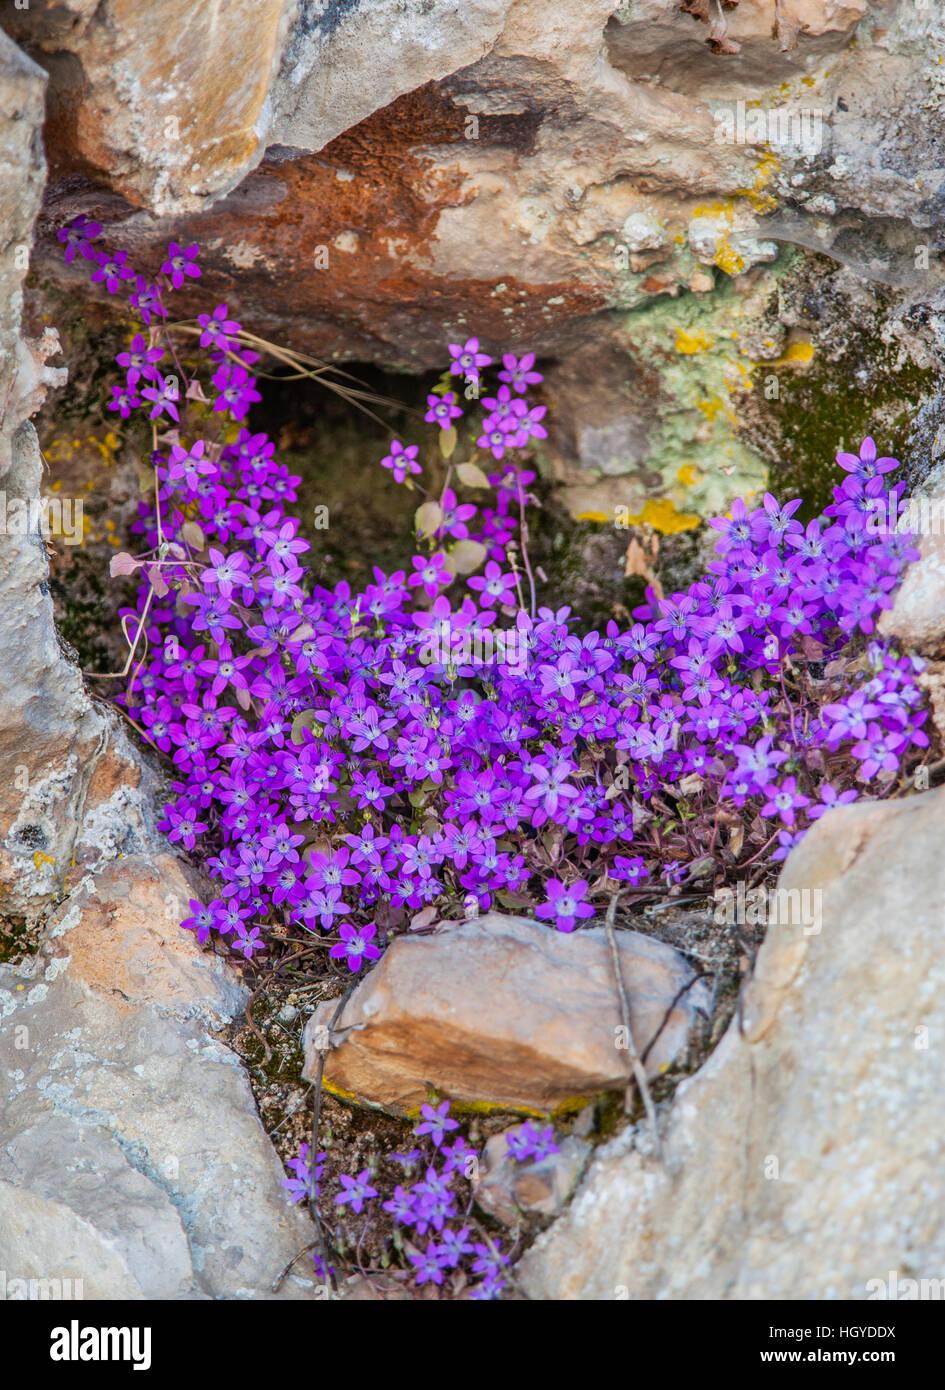 Spain, Andalusia, Province of Cadiz,  Parque Natural Sierra de Grazalema, campanula speculariodes purple wildflowers - Stock Image